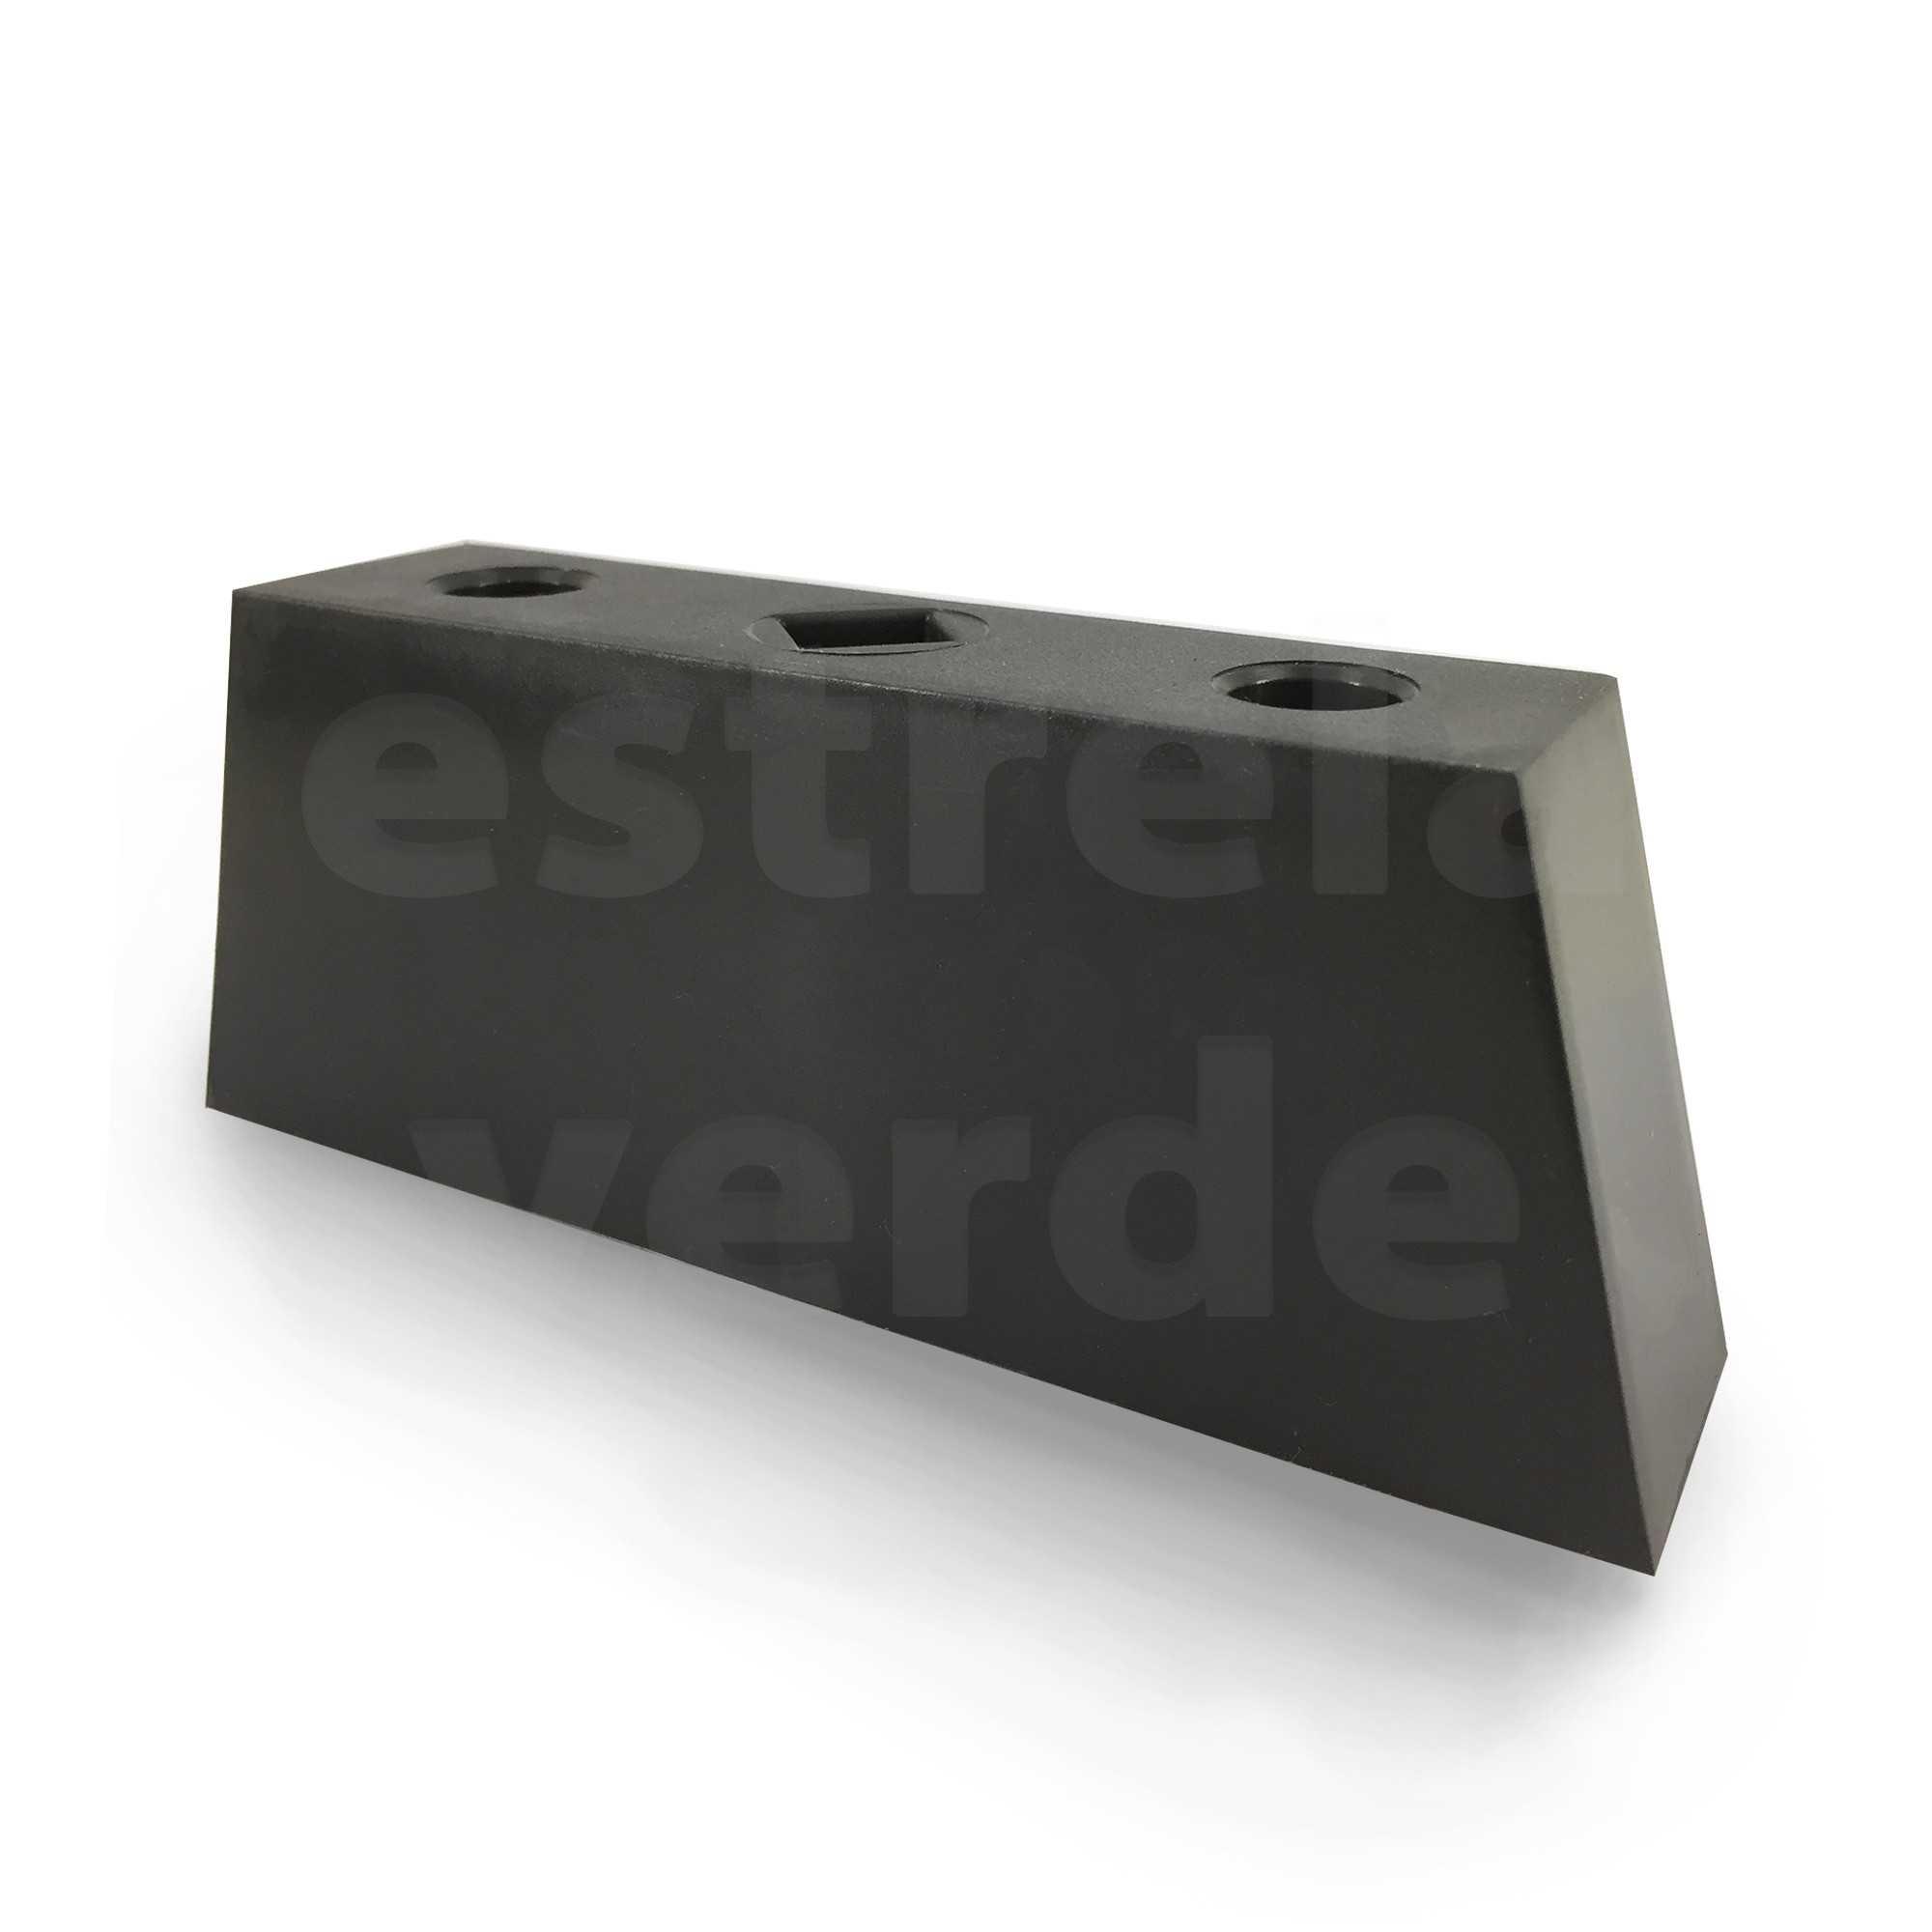 PE PVC PRETO LINEAR 5,5X15CM  - Estrela Verde